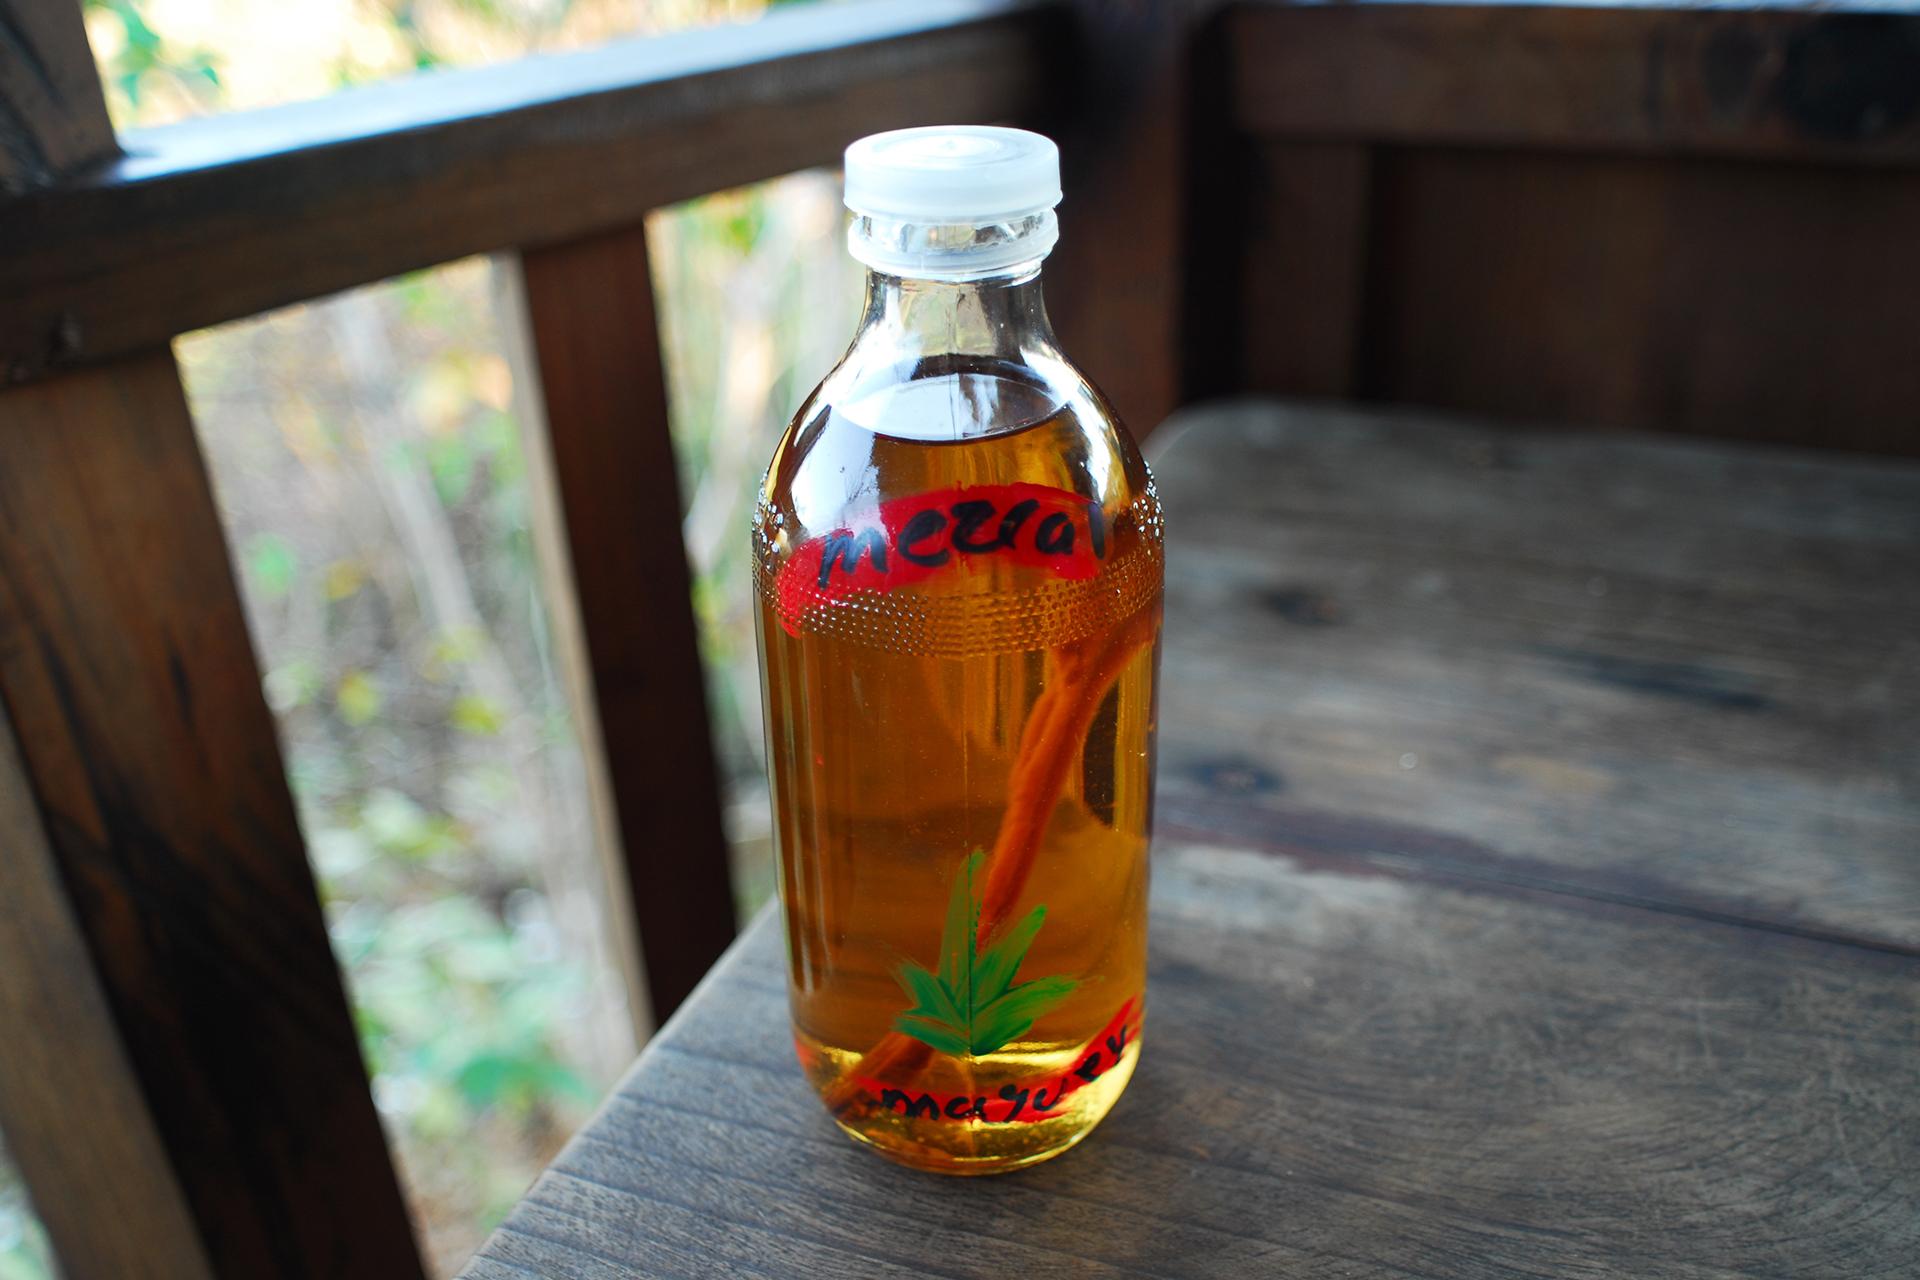 oaxaca_mexico-mezcal-bottle